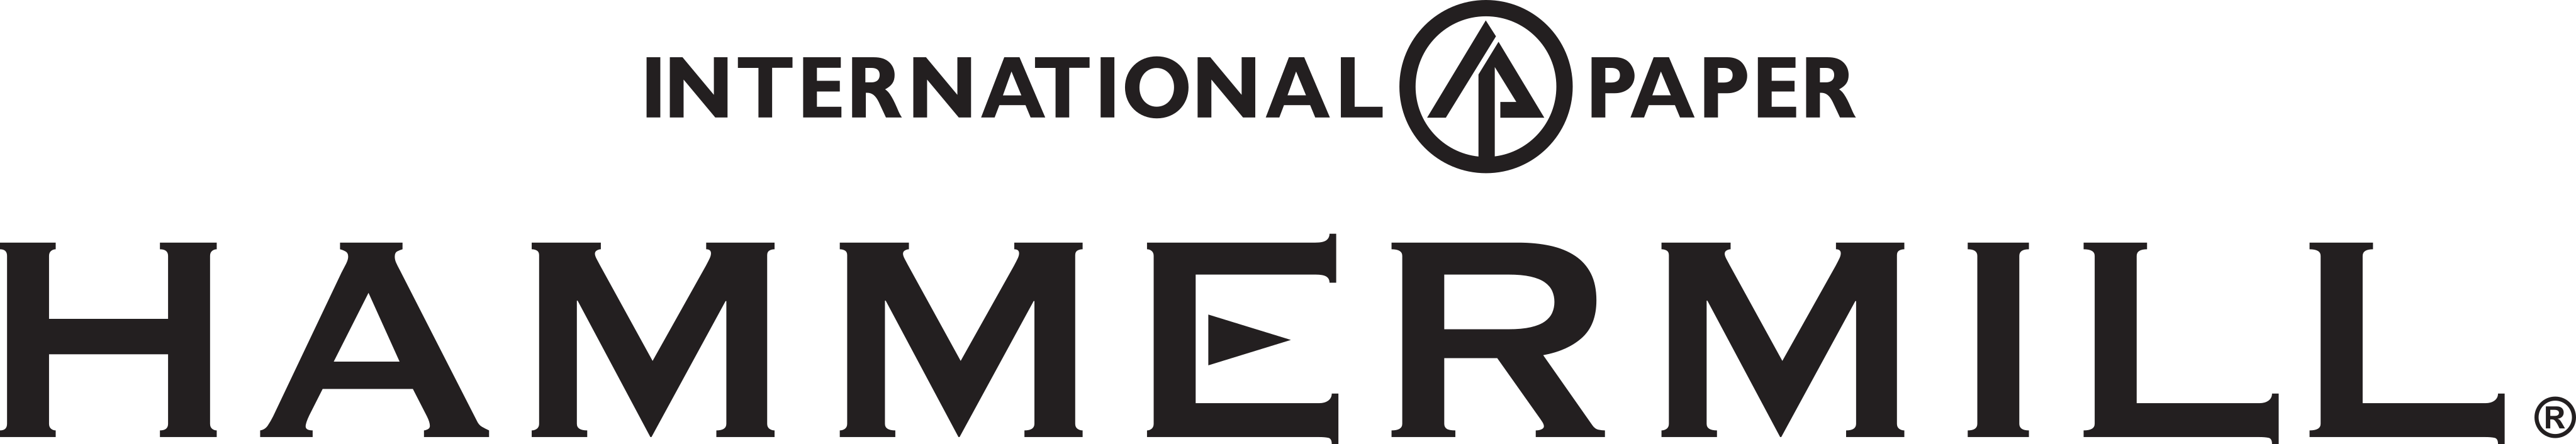 hammermill paper logo - Hammermill Paper Logo